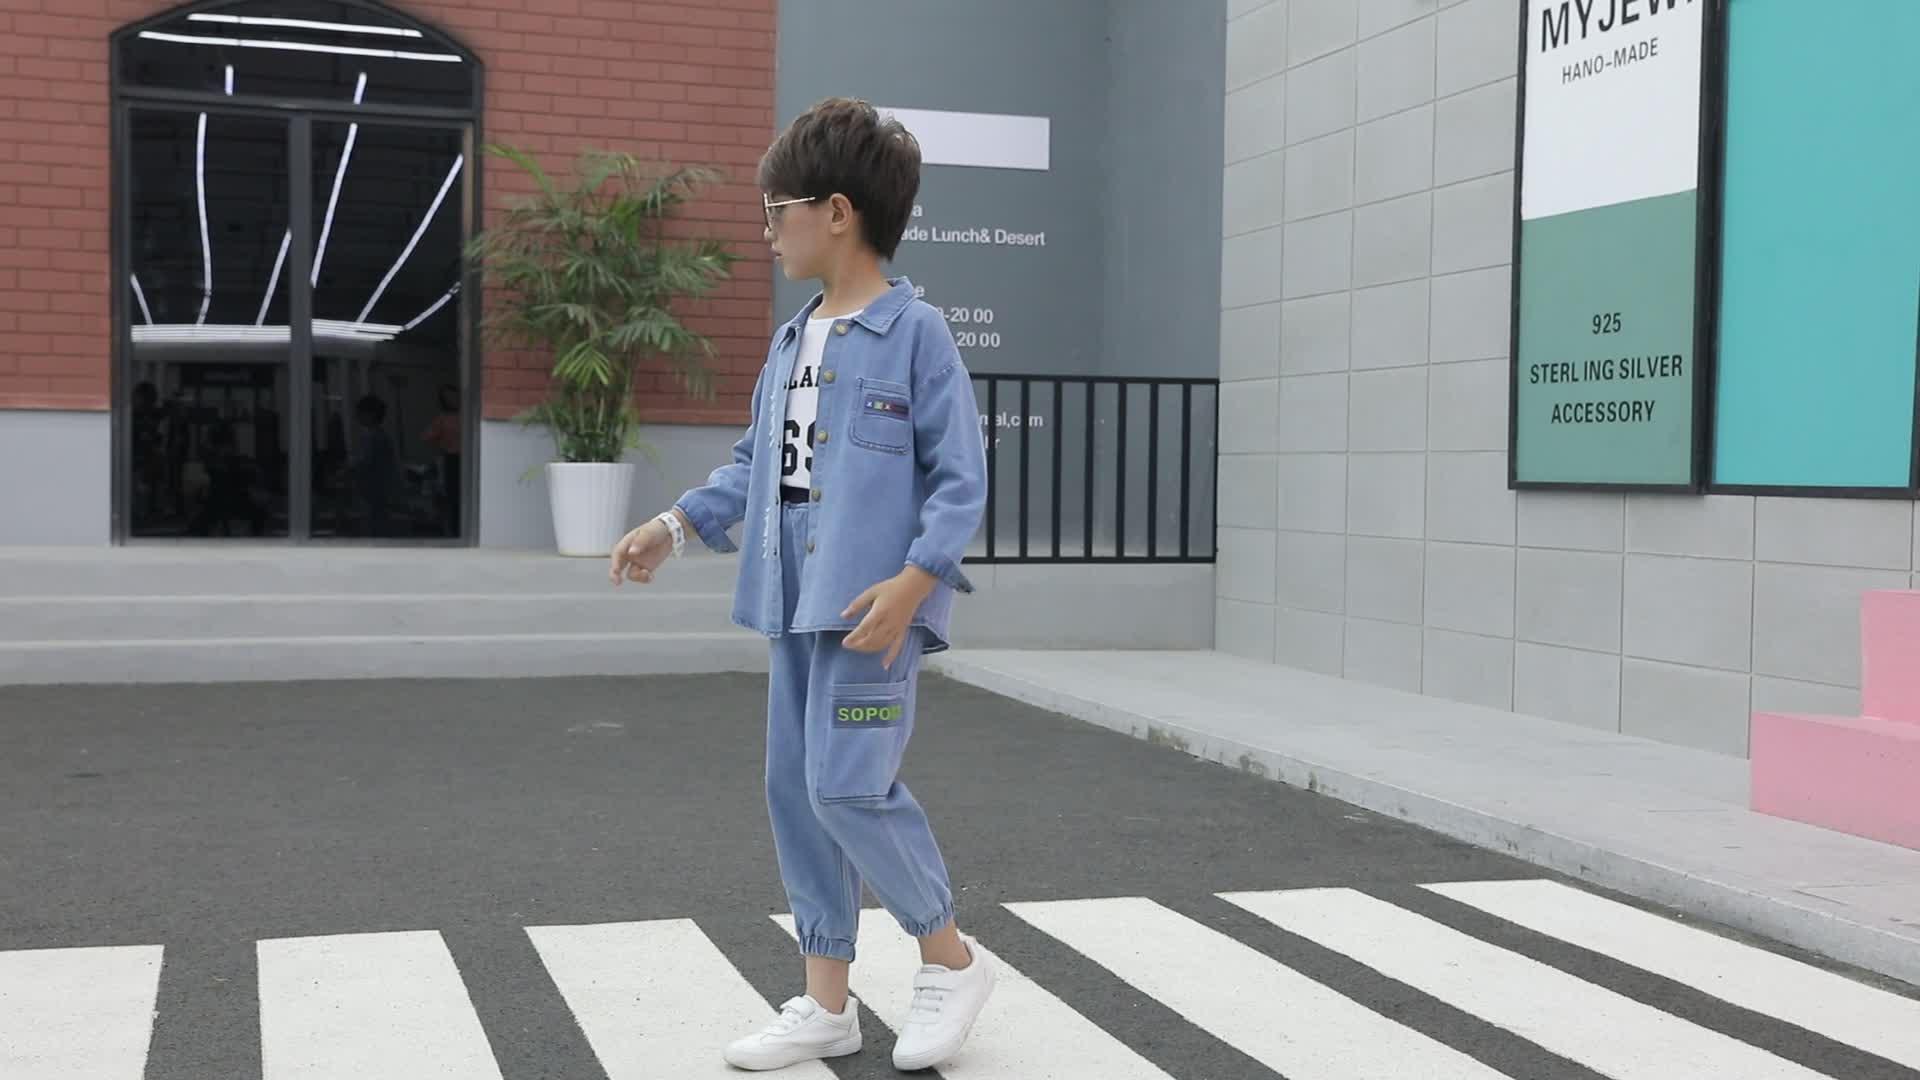 Groothandel Kinderkleding Denim Jas En Jeans Sets Kids Jongens Denim Kleding Set Voor Lente Herfst